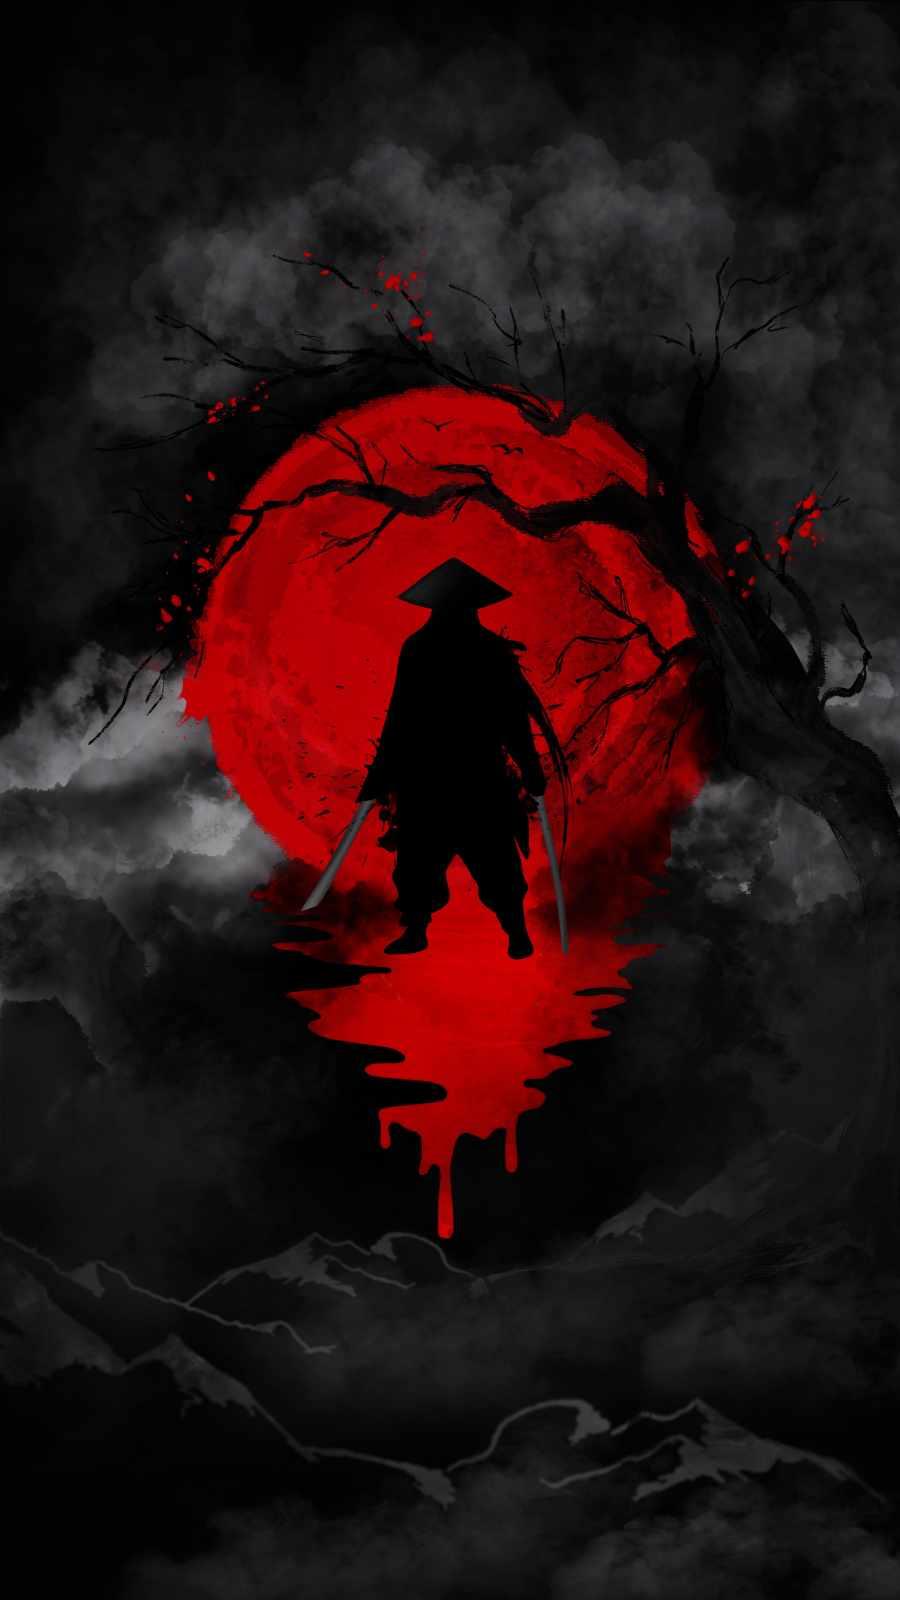 Blood Ninja Warrior